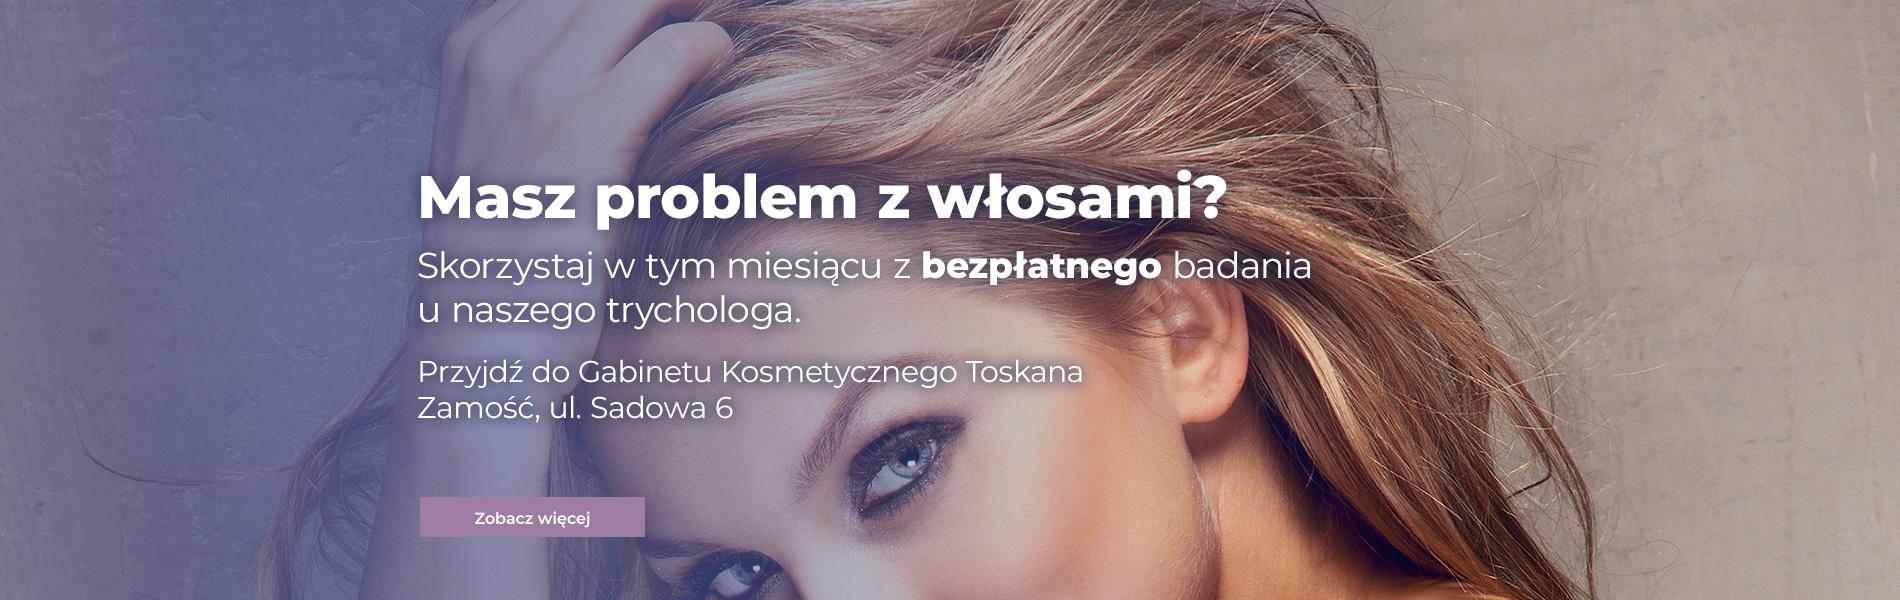 top-promo2